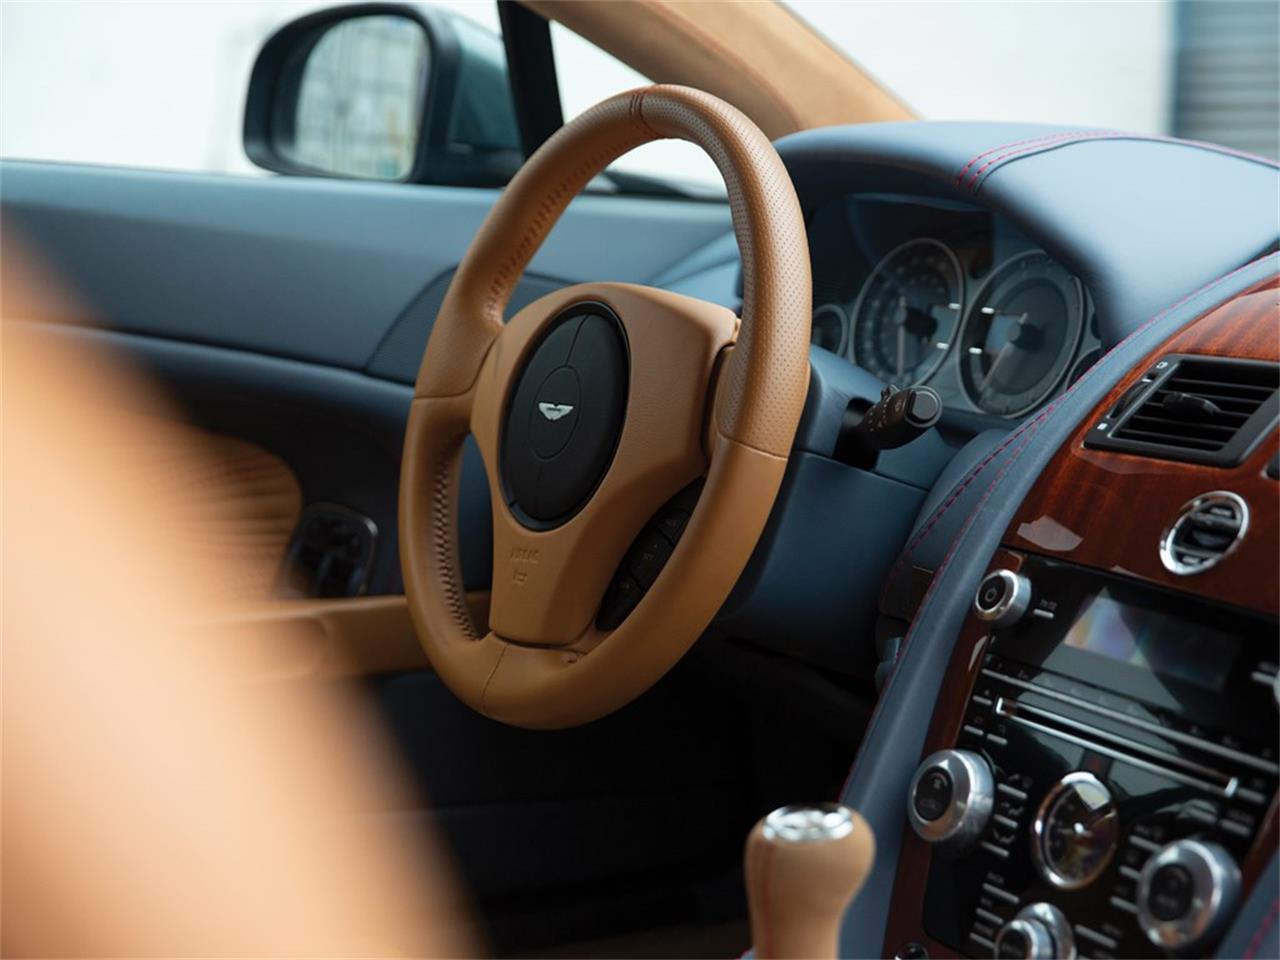 Large Picture of 2012 V12 Zagato located in Cernobbio  Auction Vehicle - Q37F